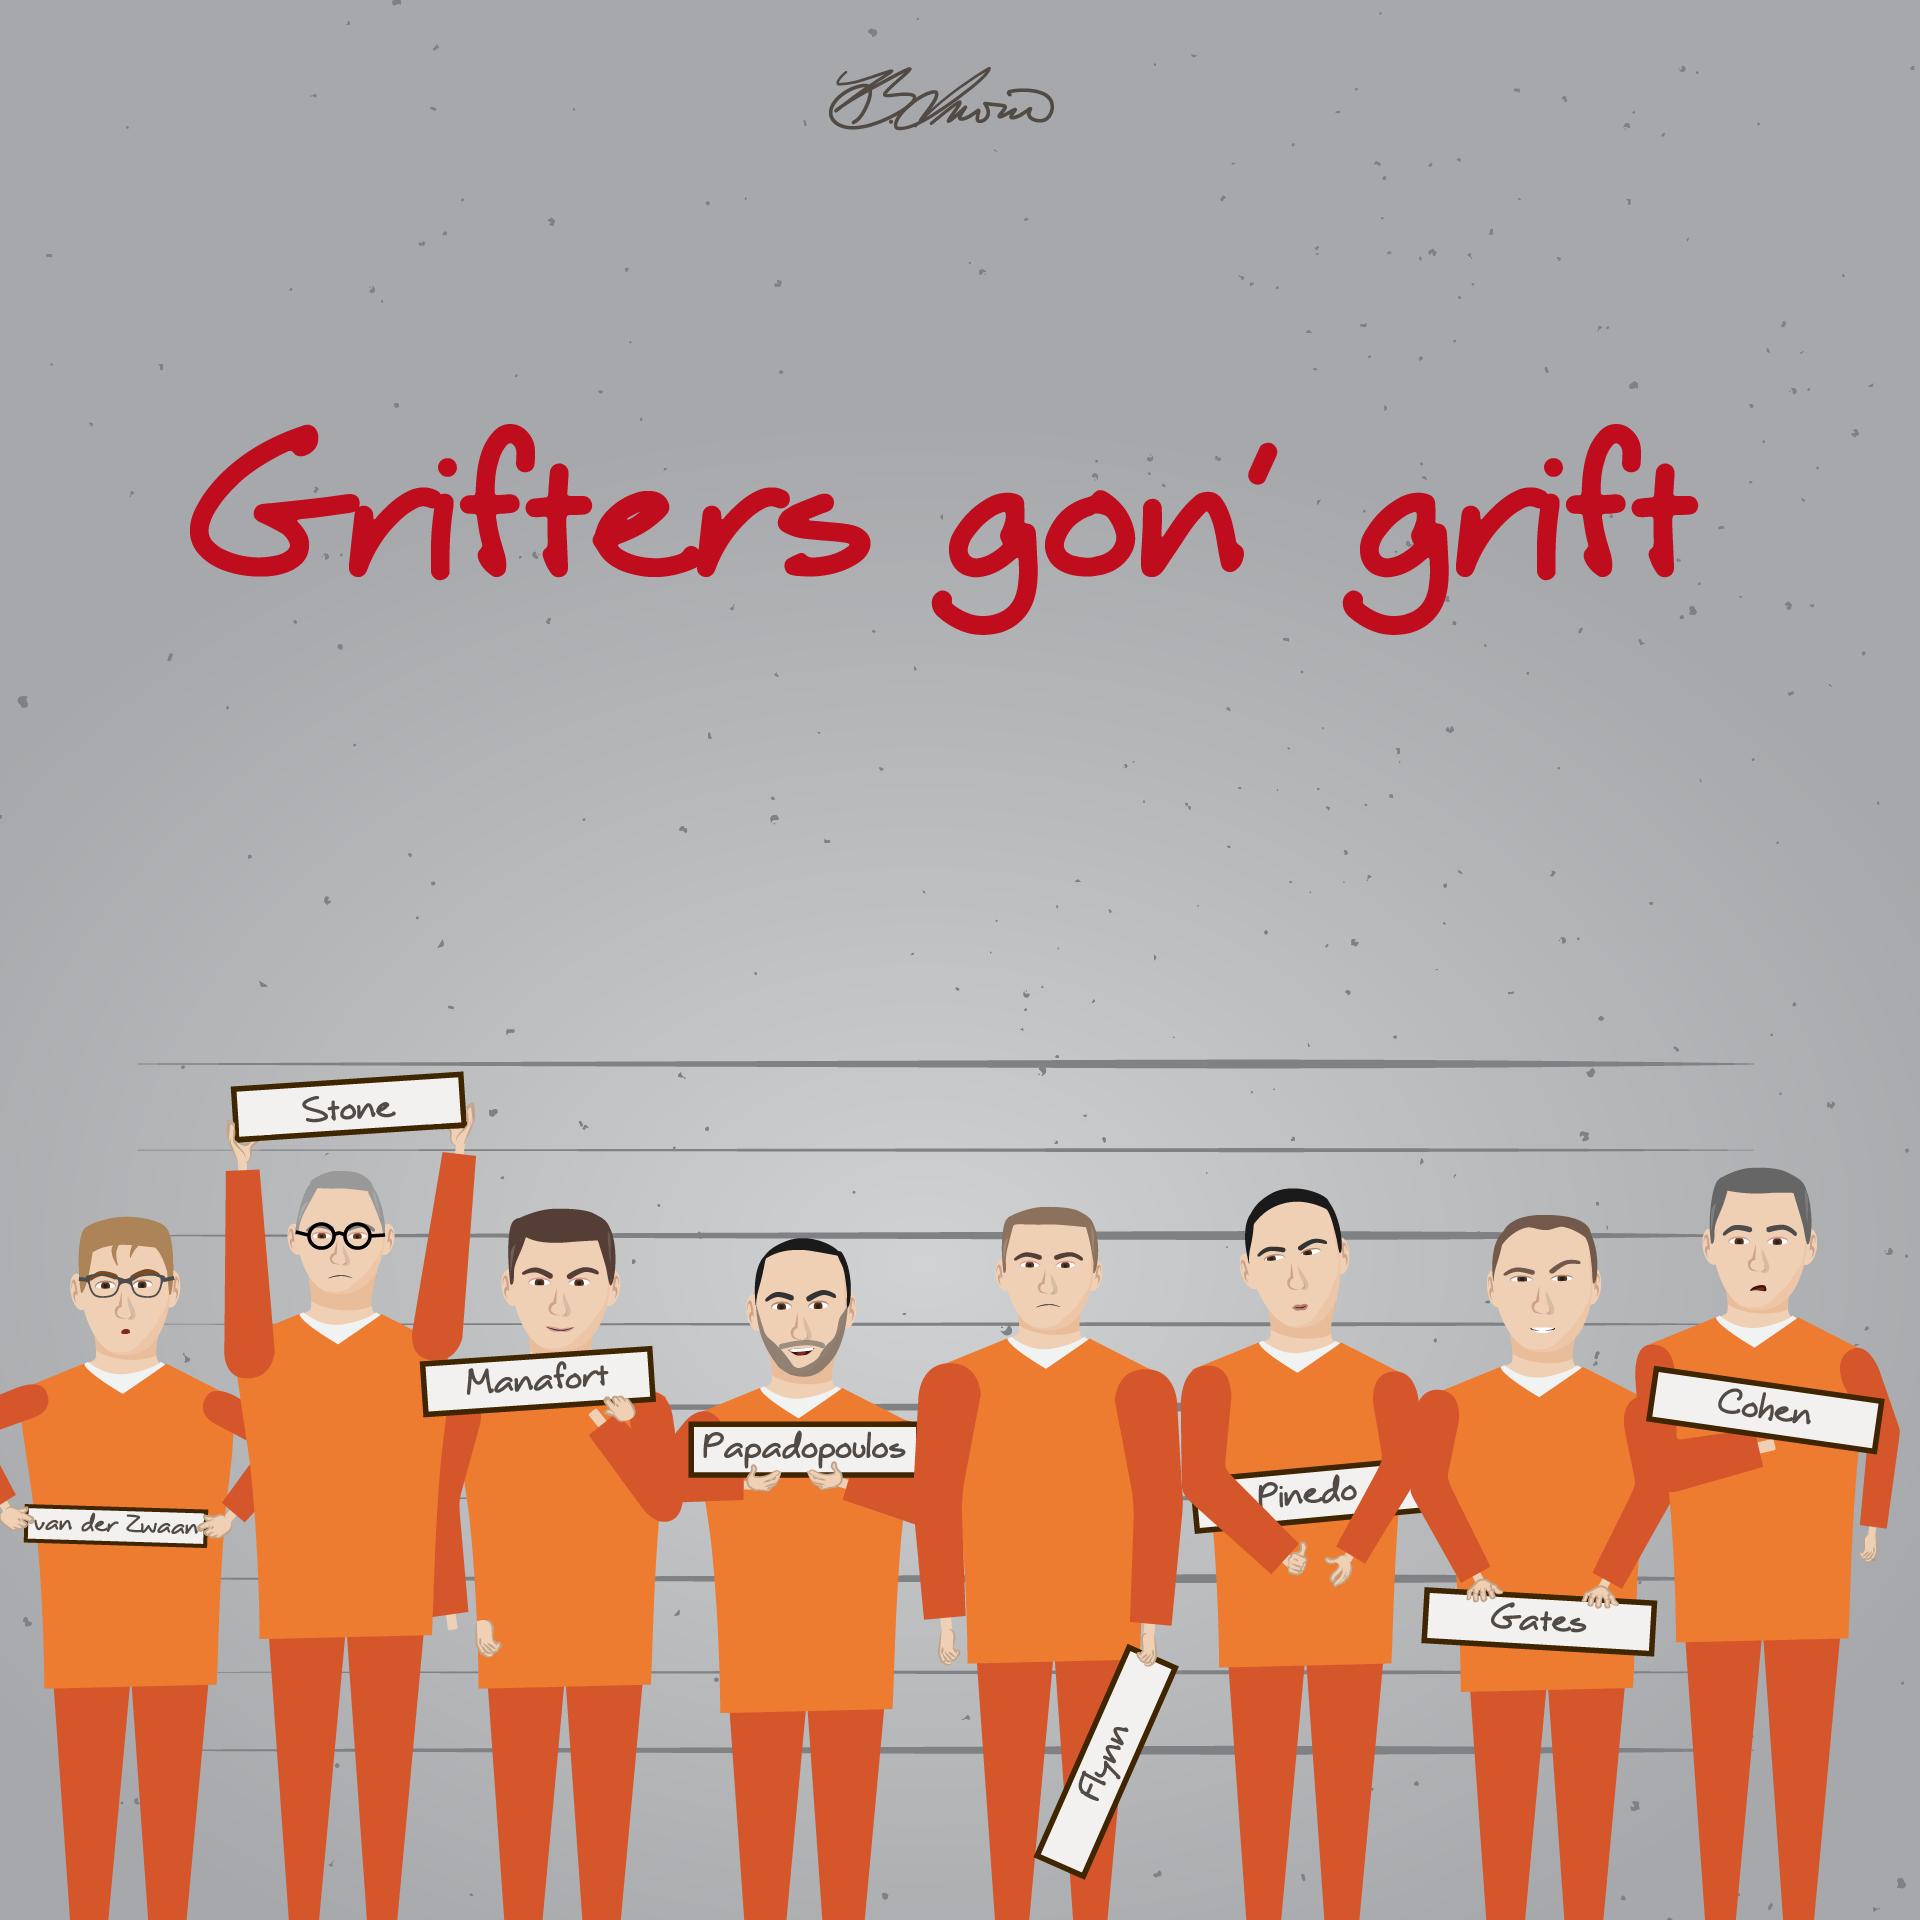 2019.03.13_Grifters Gon Grift_Panel01-Instagram.png